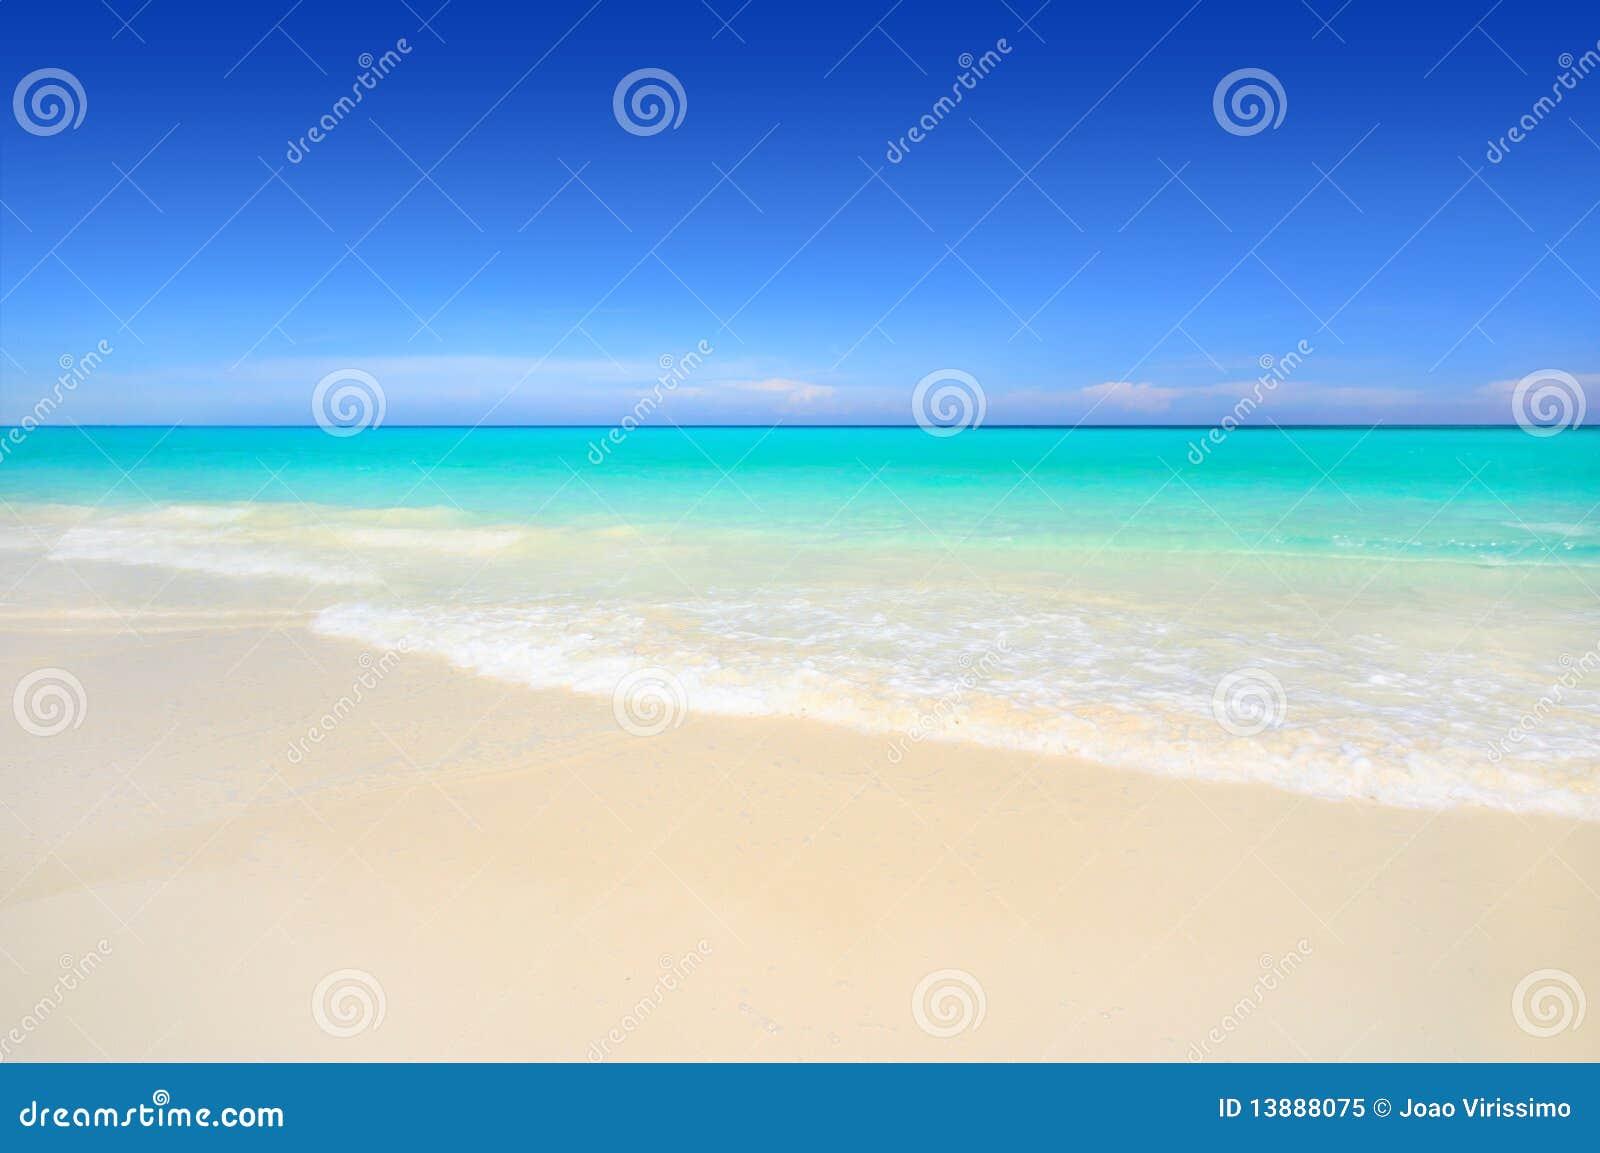 Idyllic white sand tropical beach